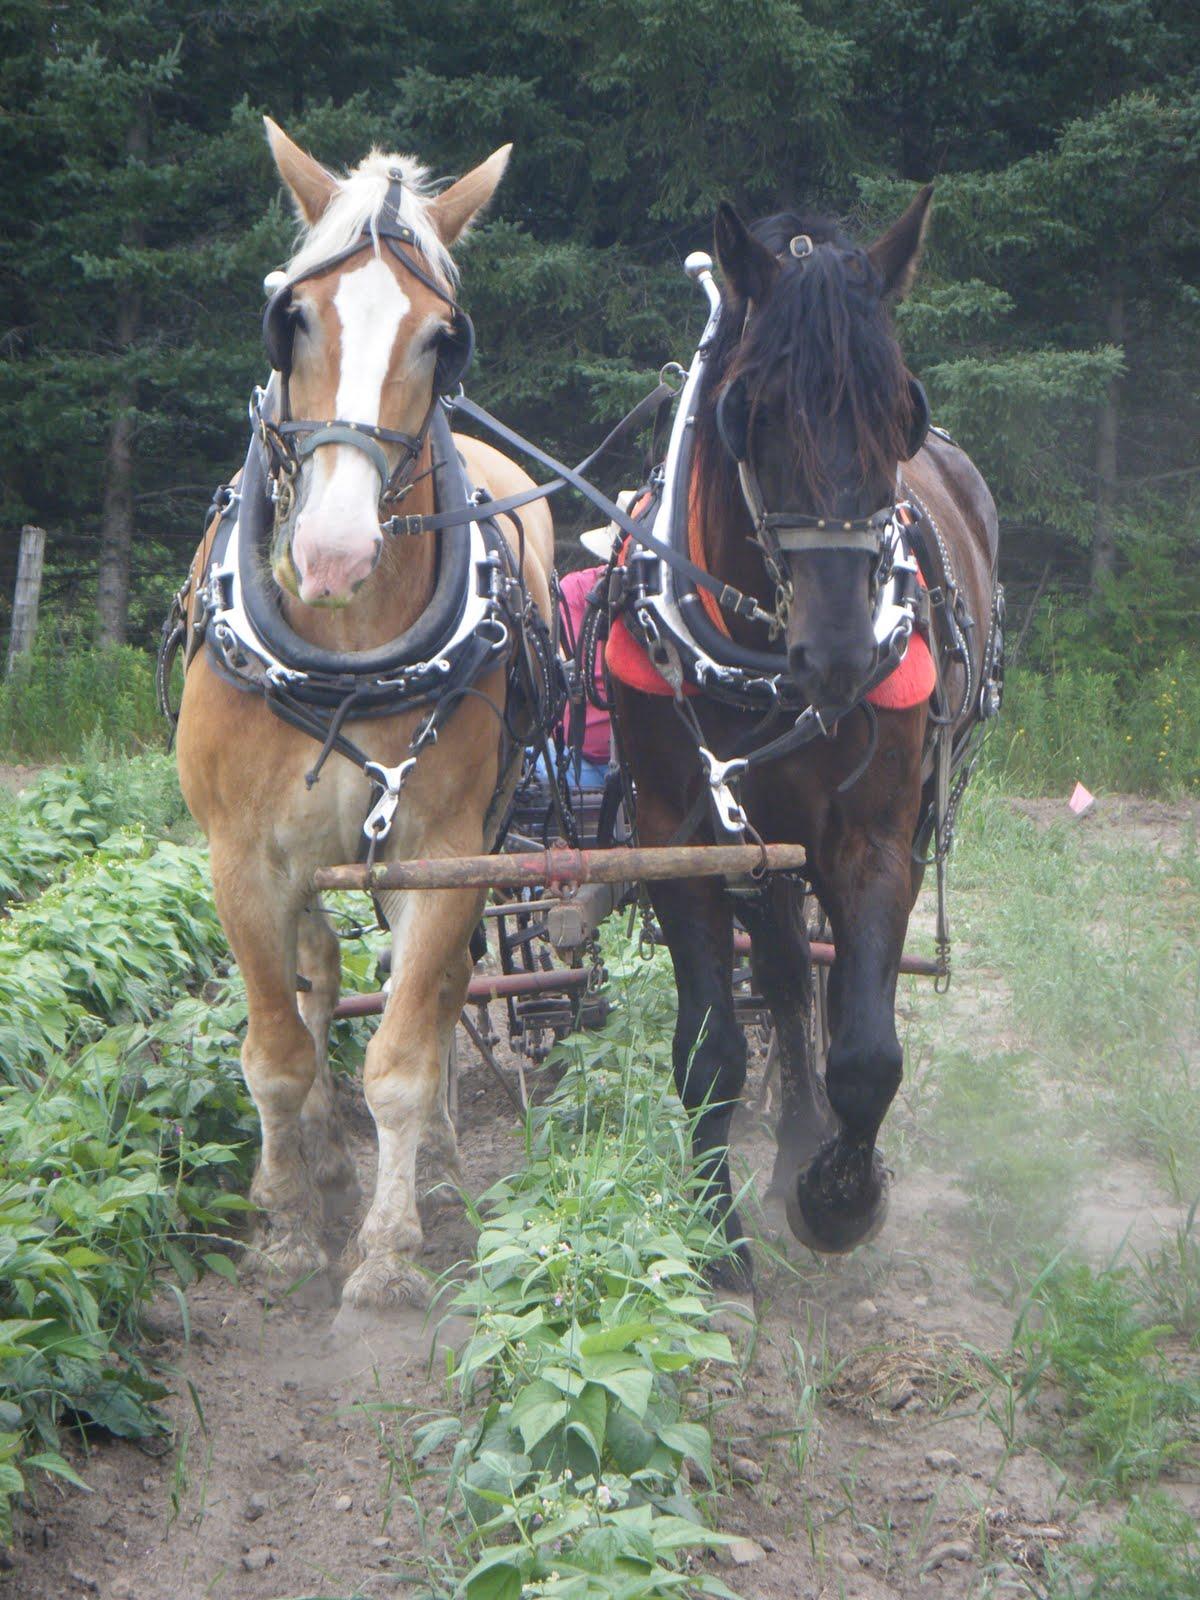 http://3.bp.blogspot.com/_q_NXSNbT0mI/TFDQtSV3DNI/AAAAAAAAAQg/qNzETTo_sbg/s1600/CRAFT+draft+horses+027.jpg